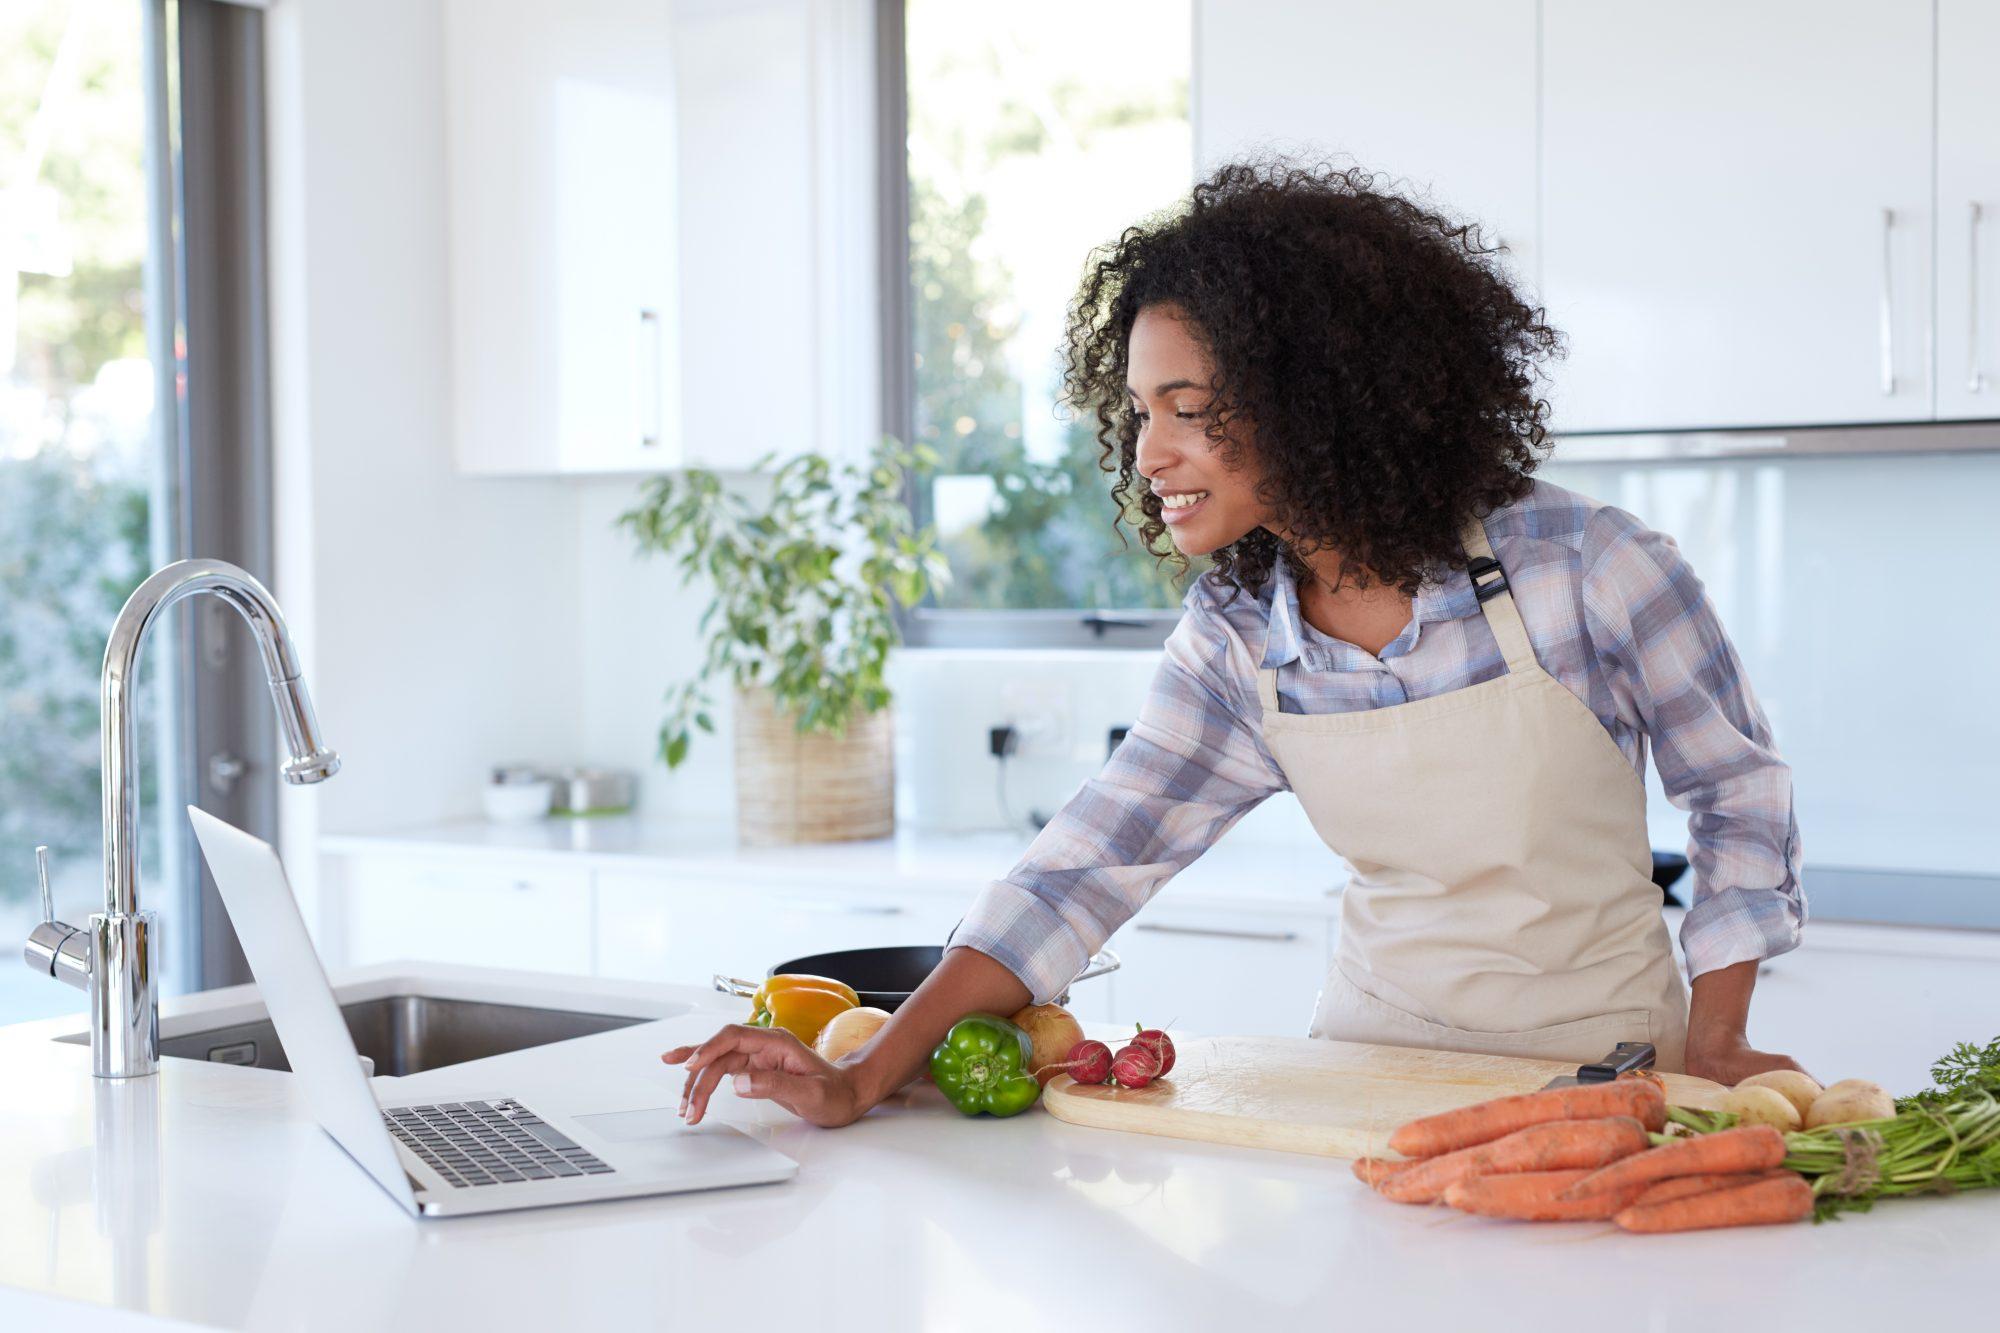 getty-online-recipe-image